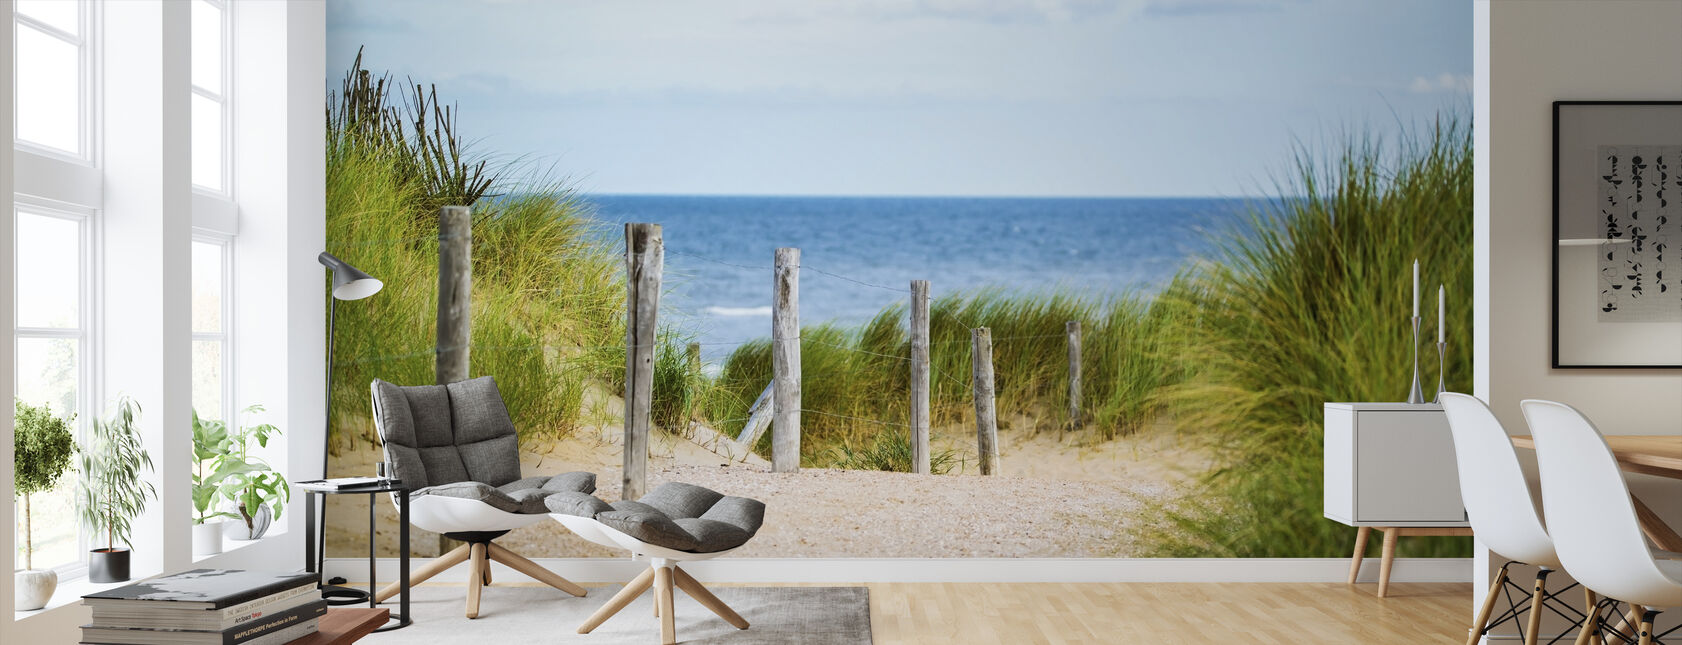 Strand hek - Behang - Woonkamer